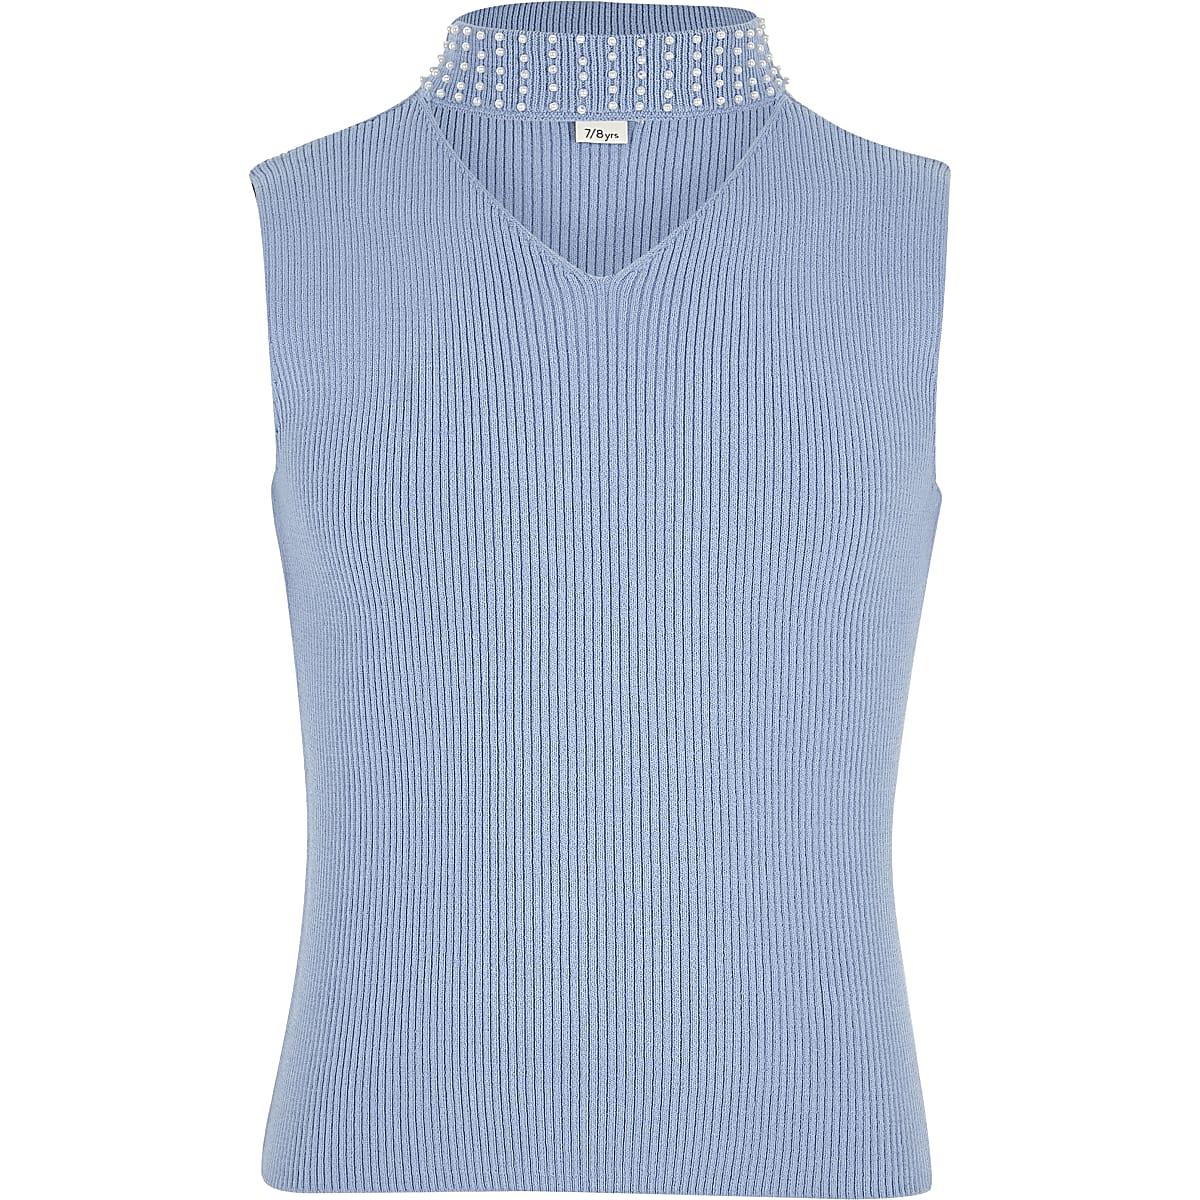 Girls blue rib knit embellished choker top